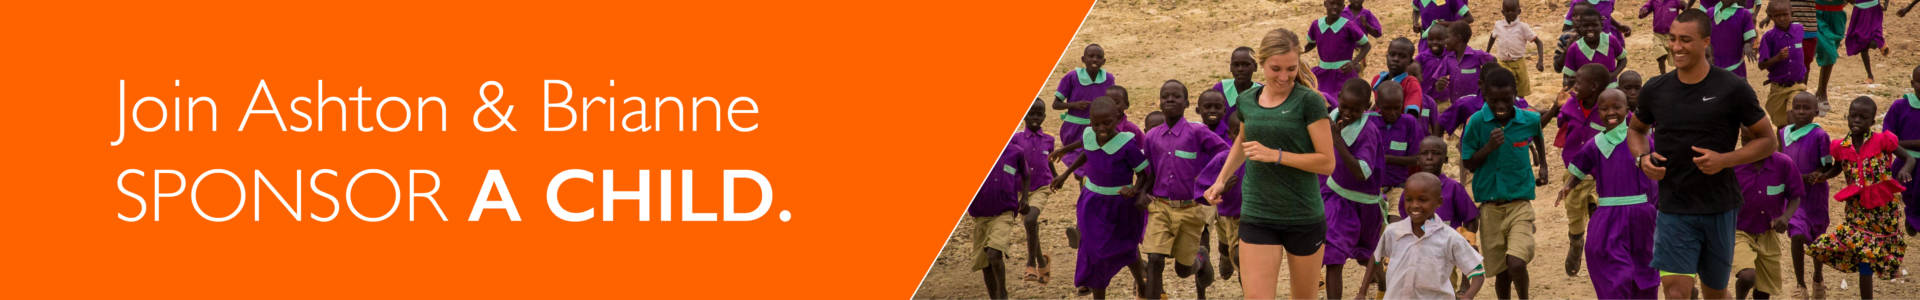 Ashton Eaton, Brianne Theisen-Eaton and sponsored child in Kenya ©2016 World Vision, Lindsay Minerva